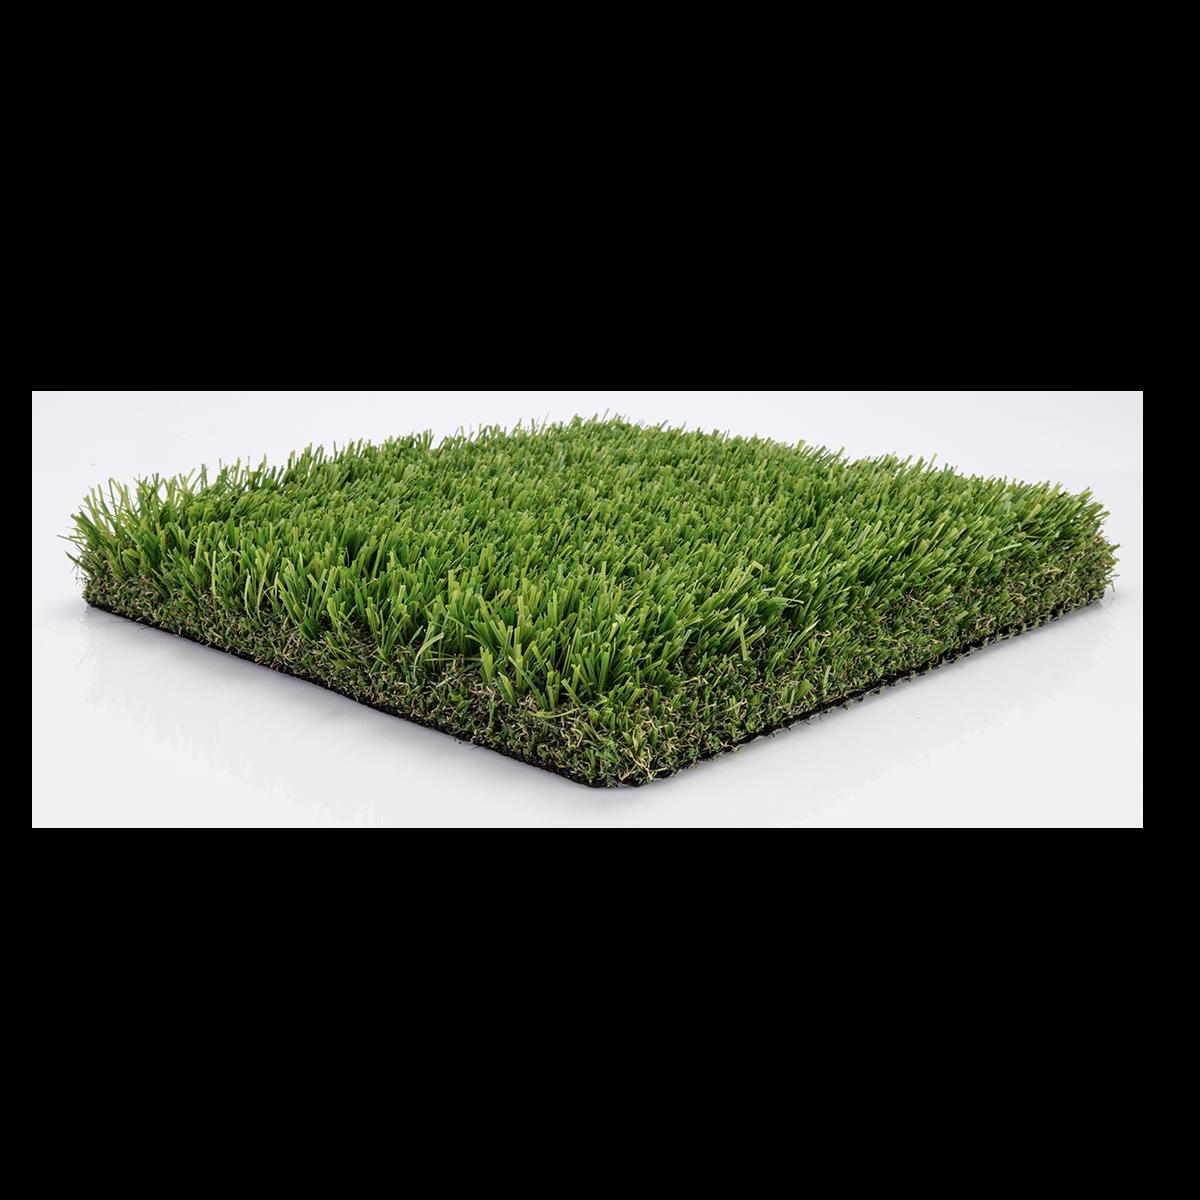 Clipart grass bermuda grass. Turfhub landscape collection